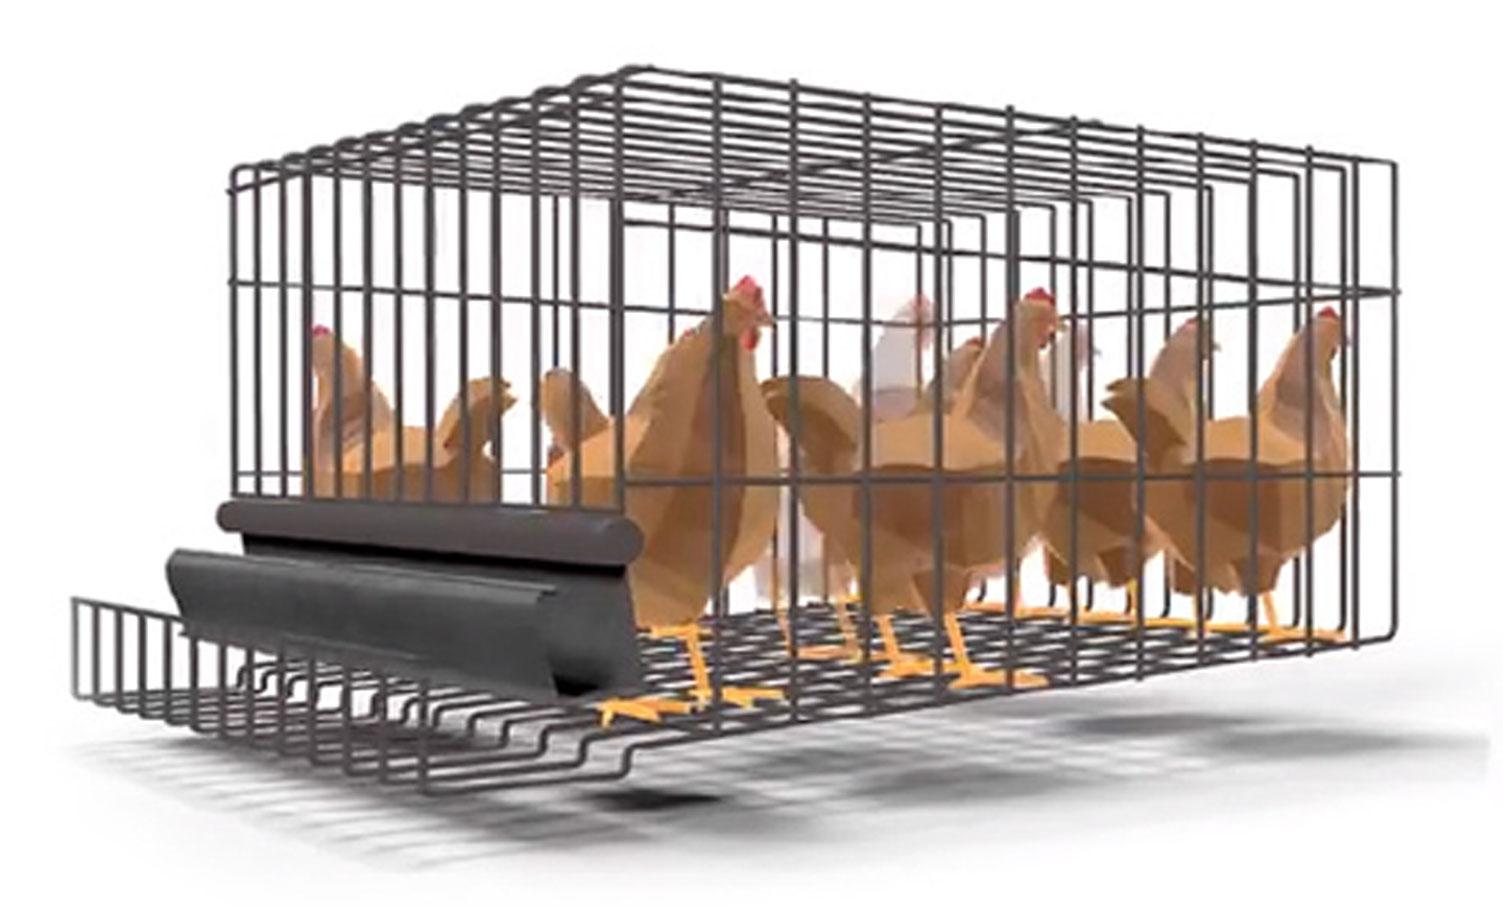 pollos en jaula